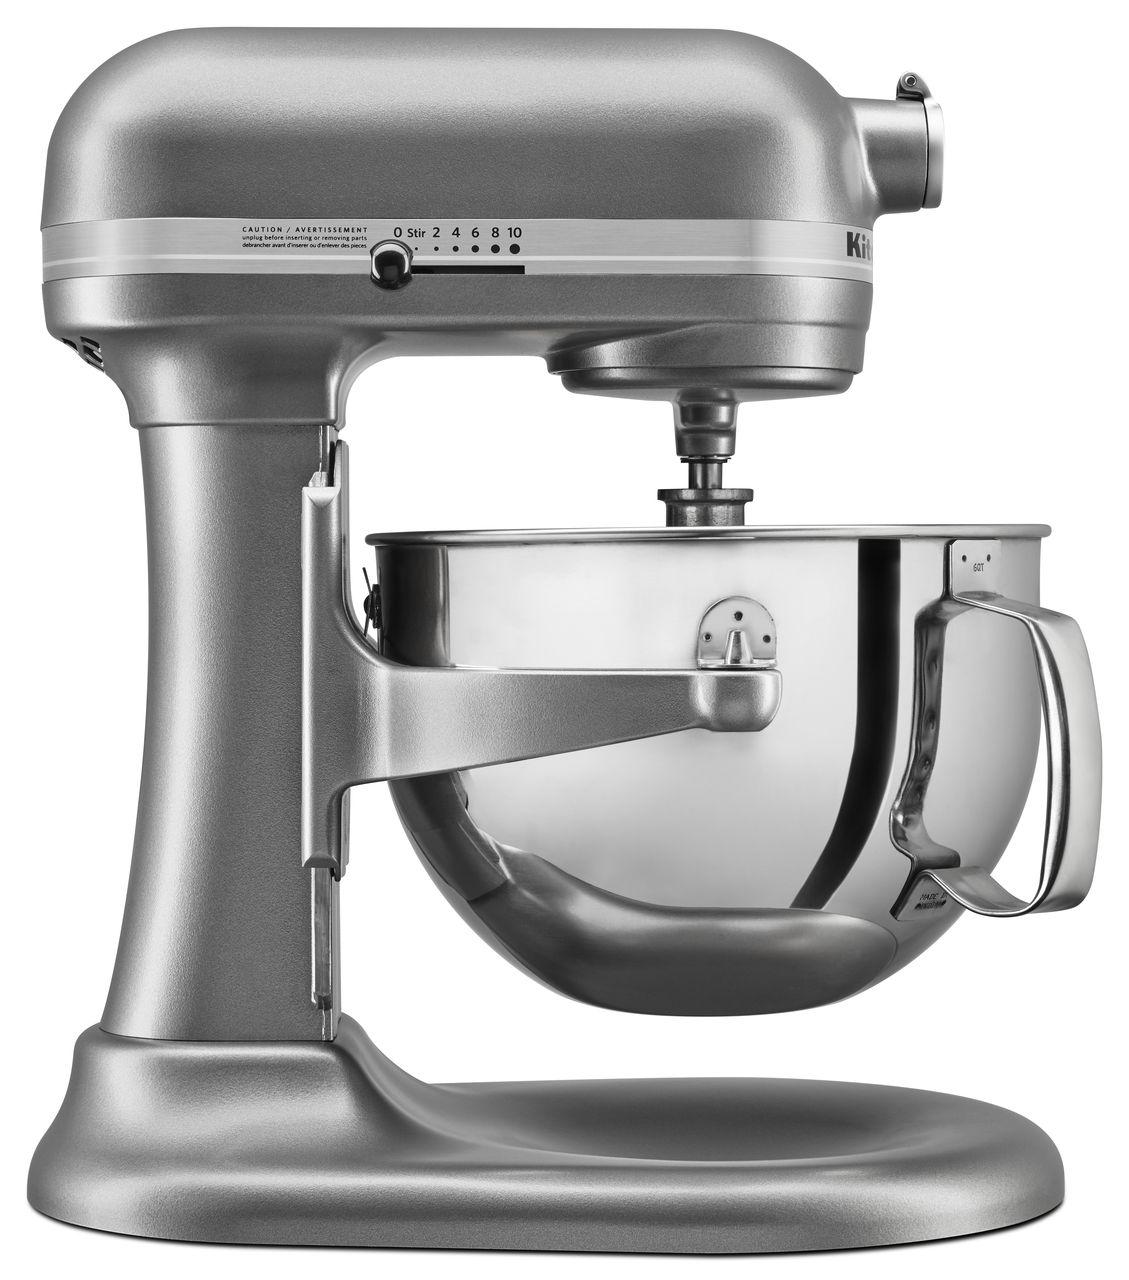 kitchenaid 8 qt mixer. picture 4 of 9 kitchenaid 8 qt mixer